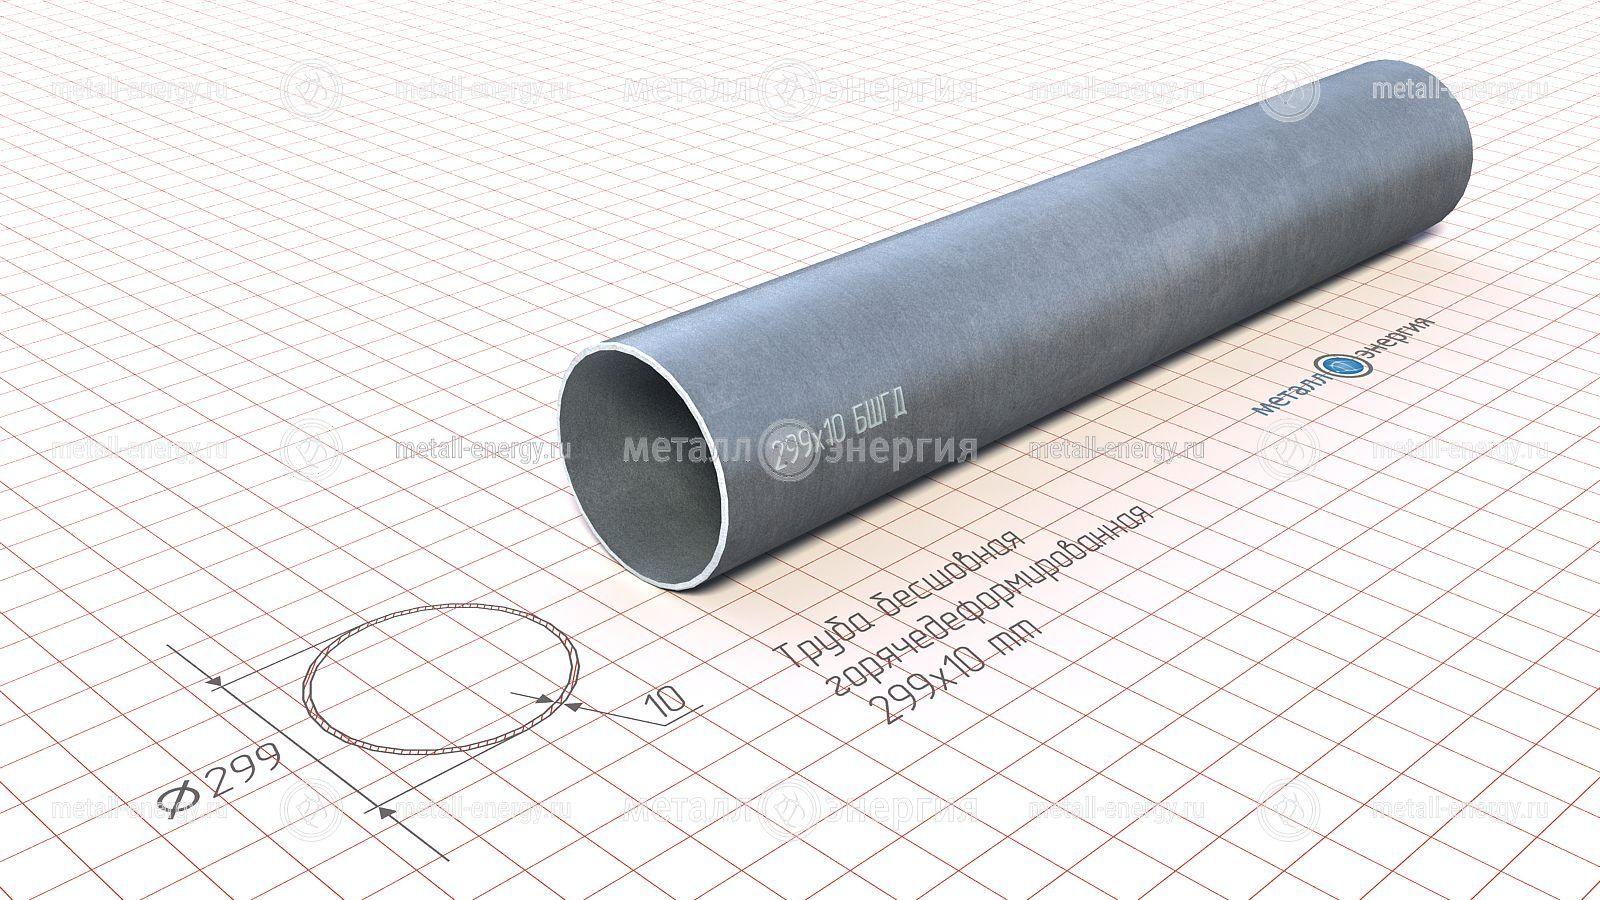 https://fermer.ru/tossl.php?url=http://www.metall-energy.ru/data/image/catalog/catalog_34/truba-besshovnaya-goryachedeformirovannaya__299_10.jpg